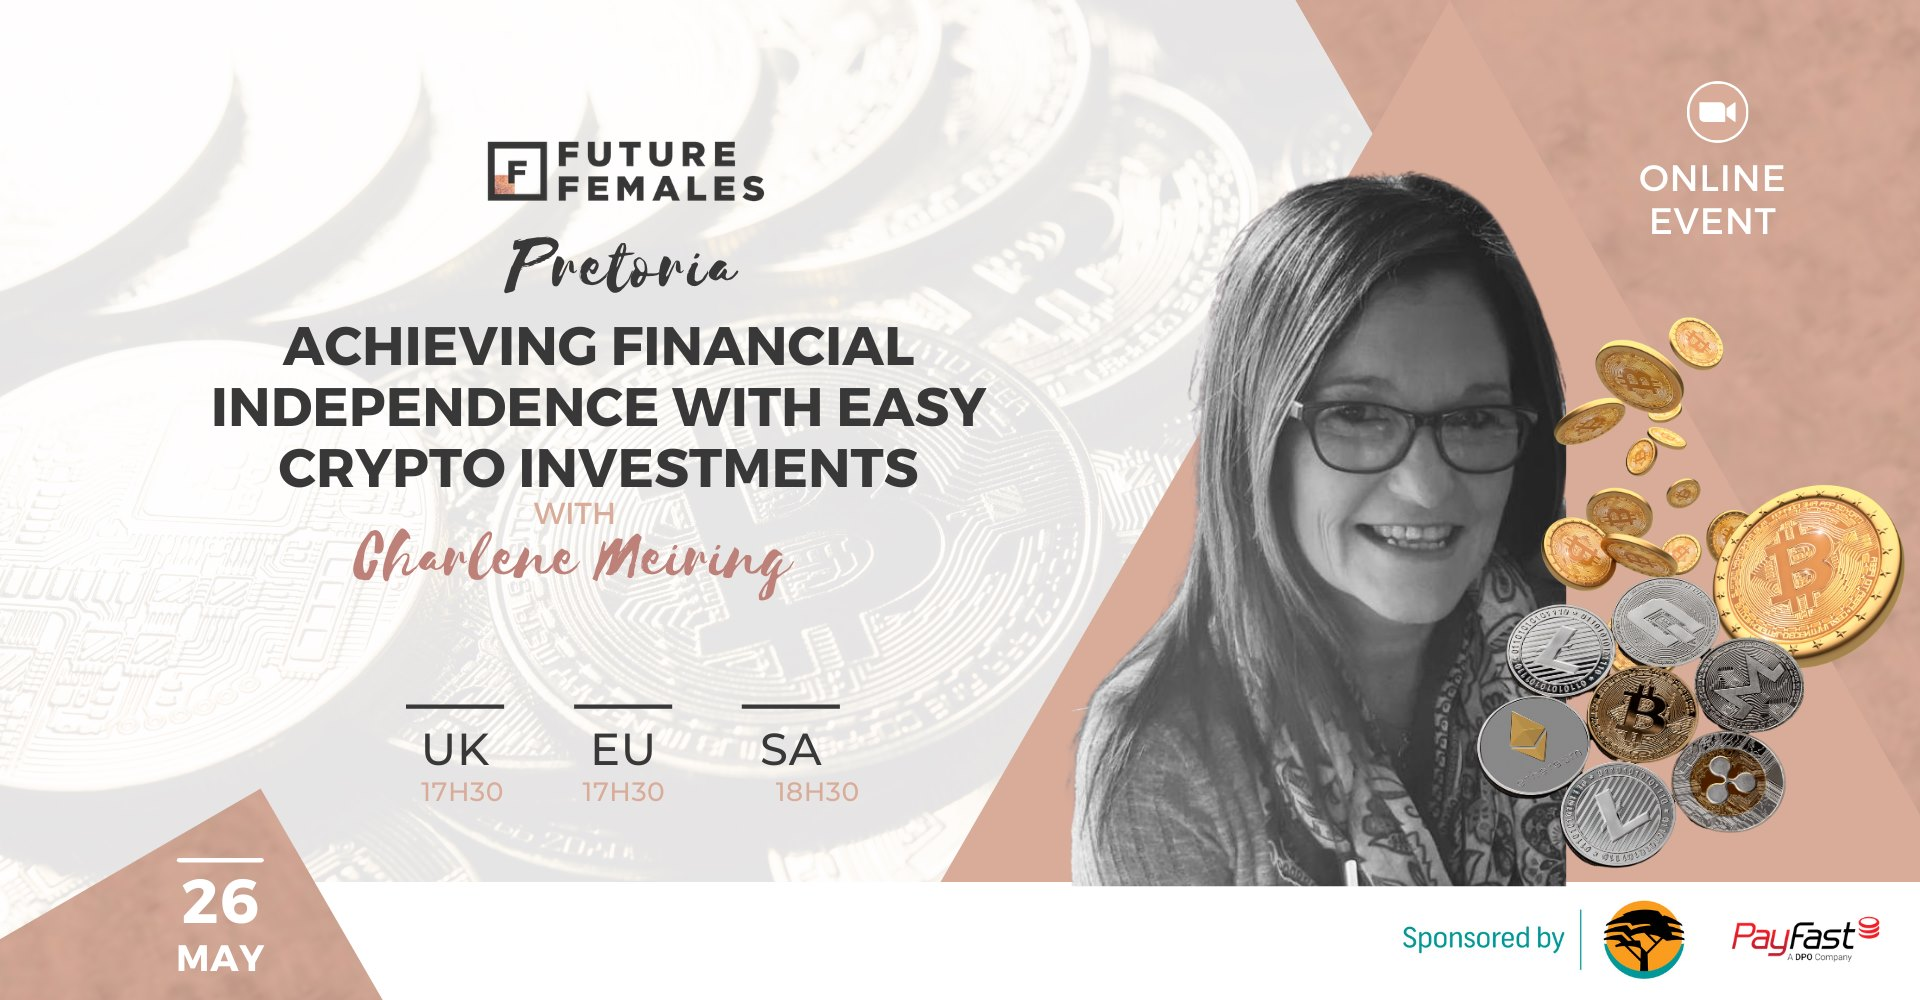 Future Females Pretoria Event - 26 May